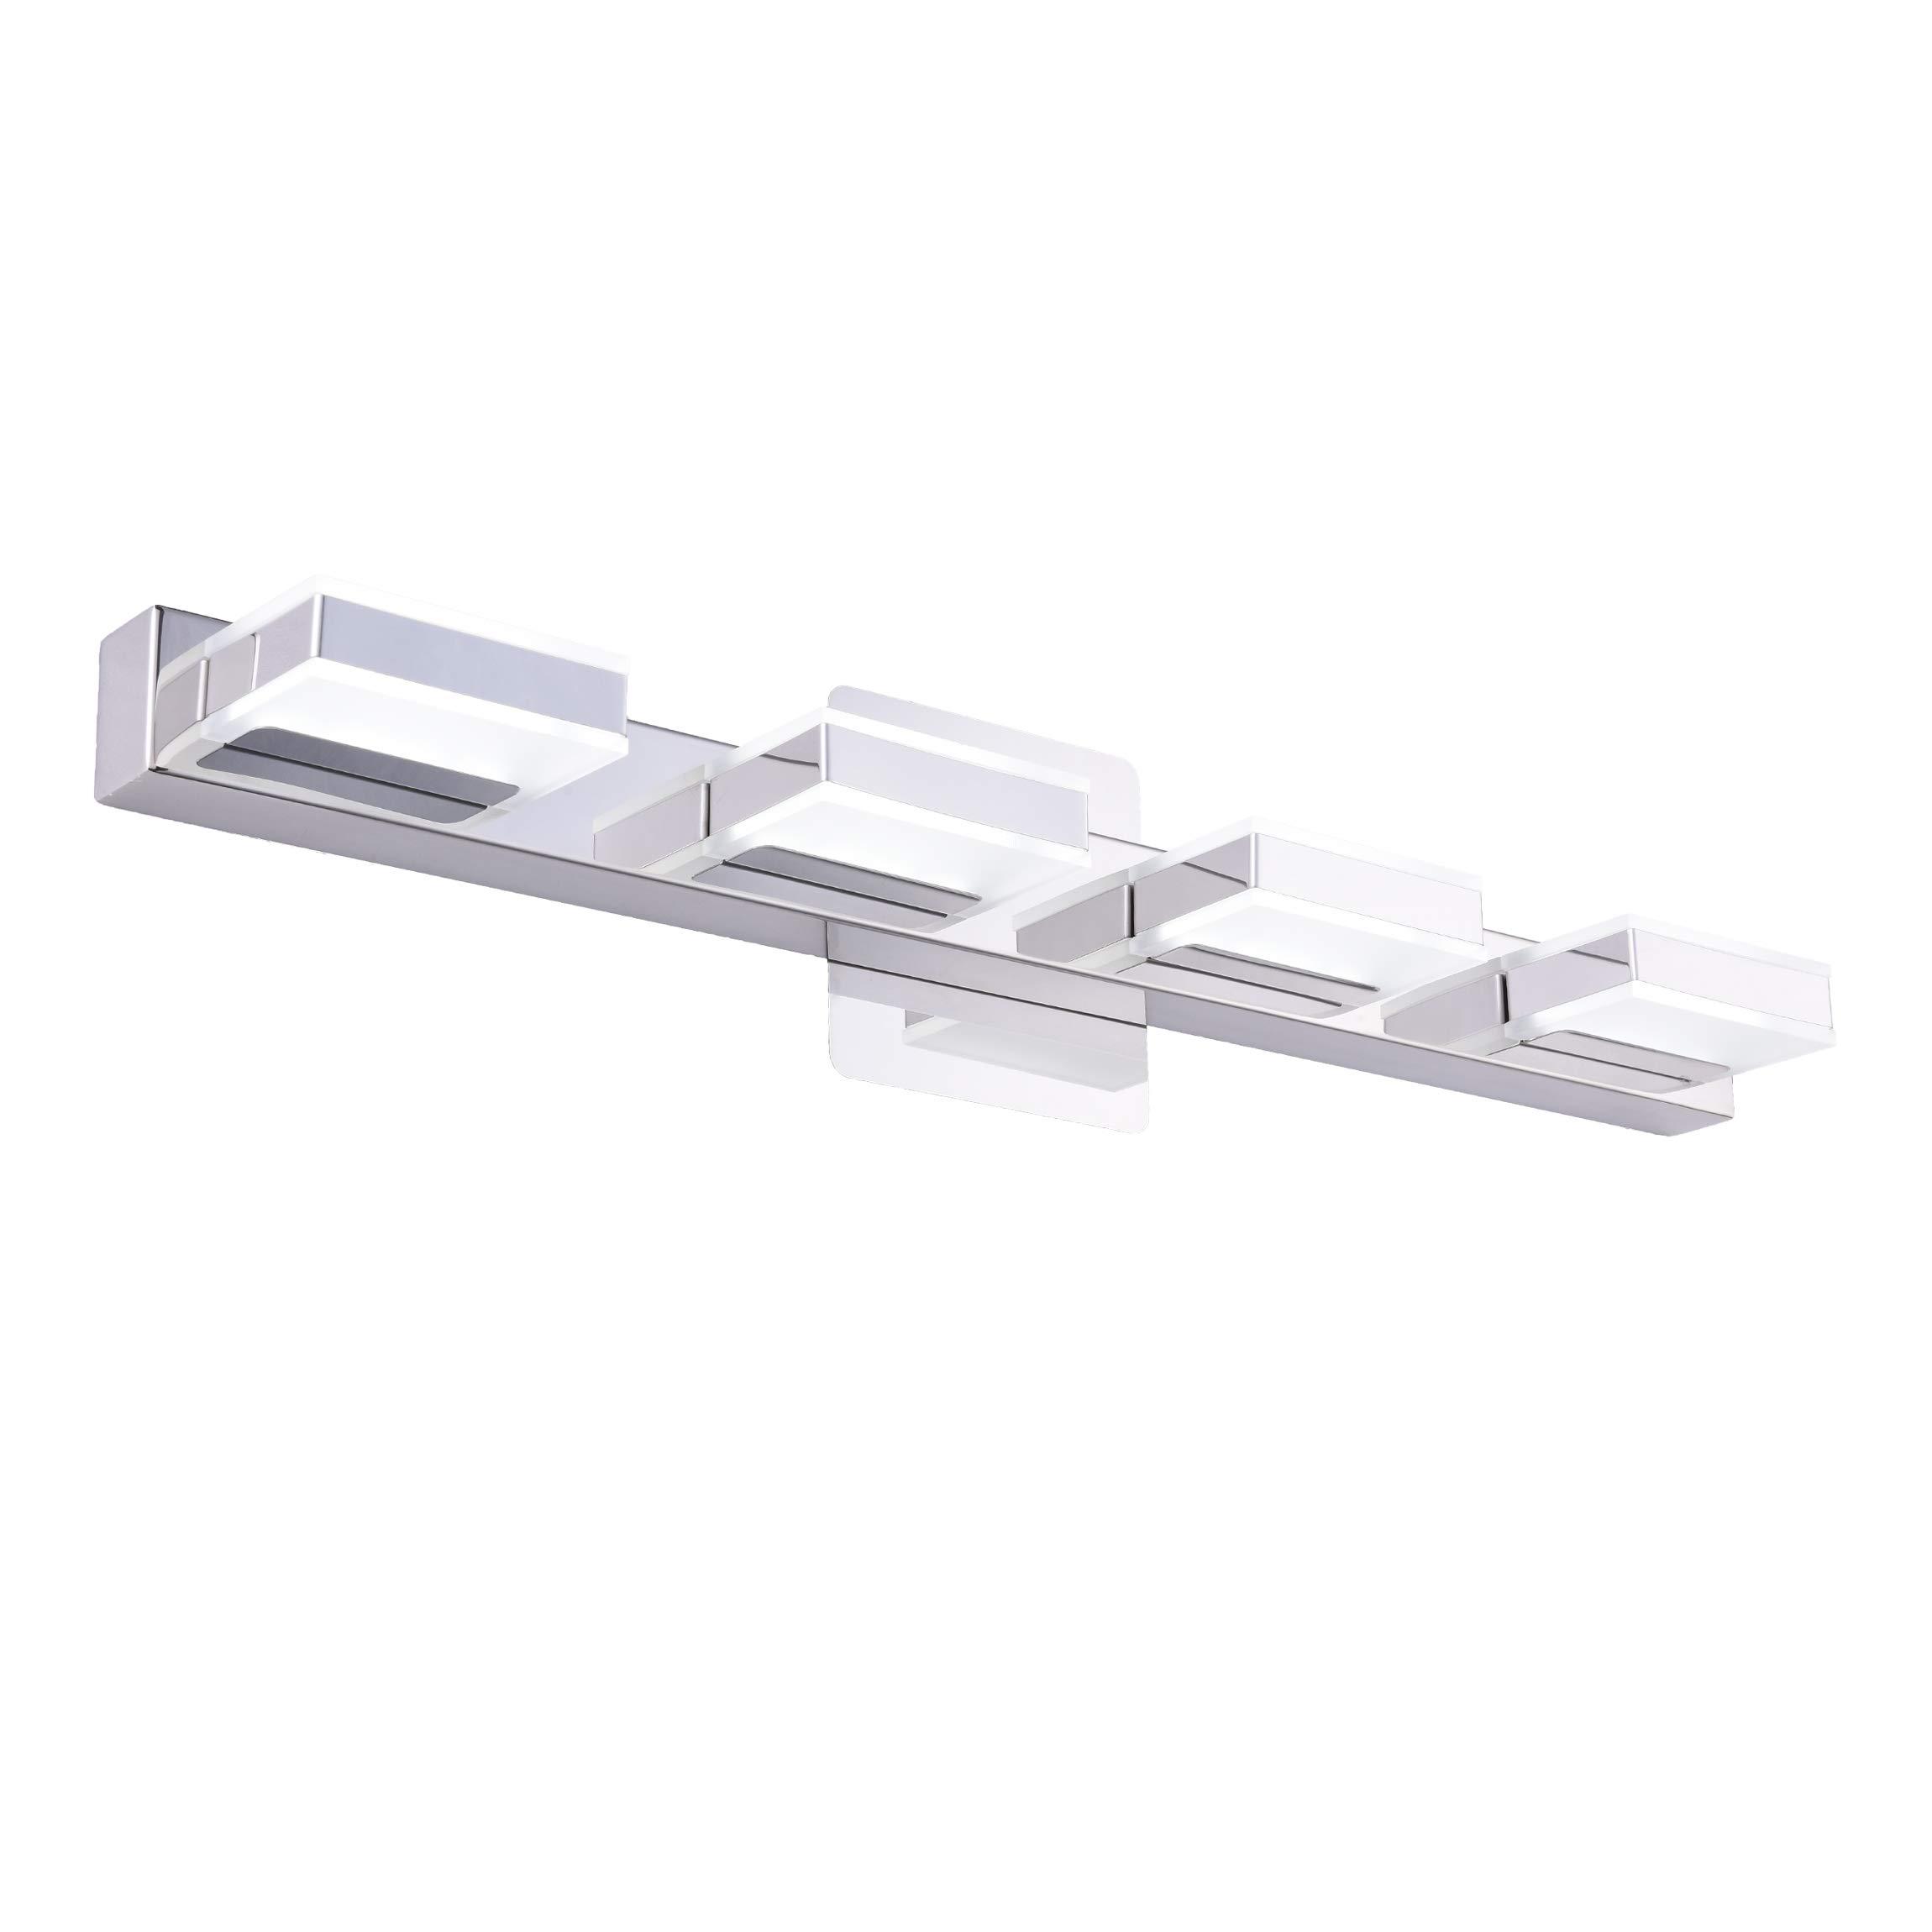 mirrea 16W Modern LED Vanity Light in 4 Lights, Cold White